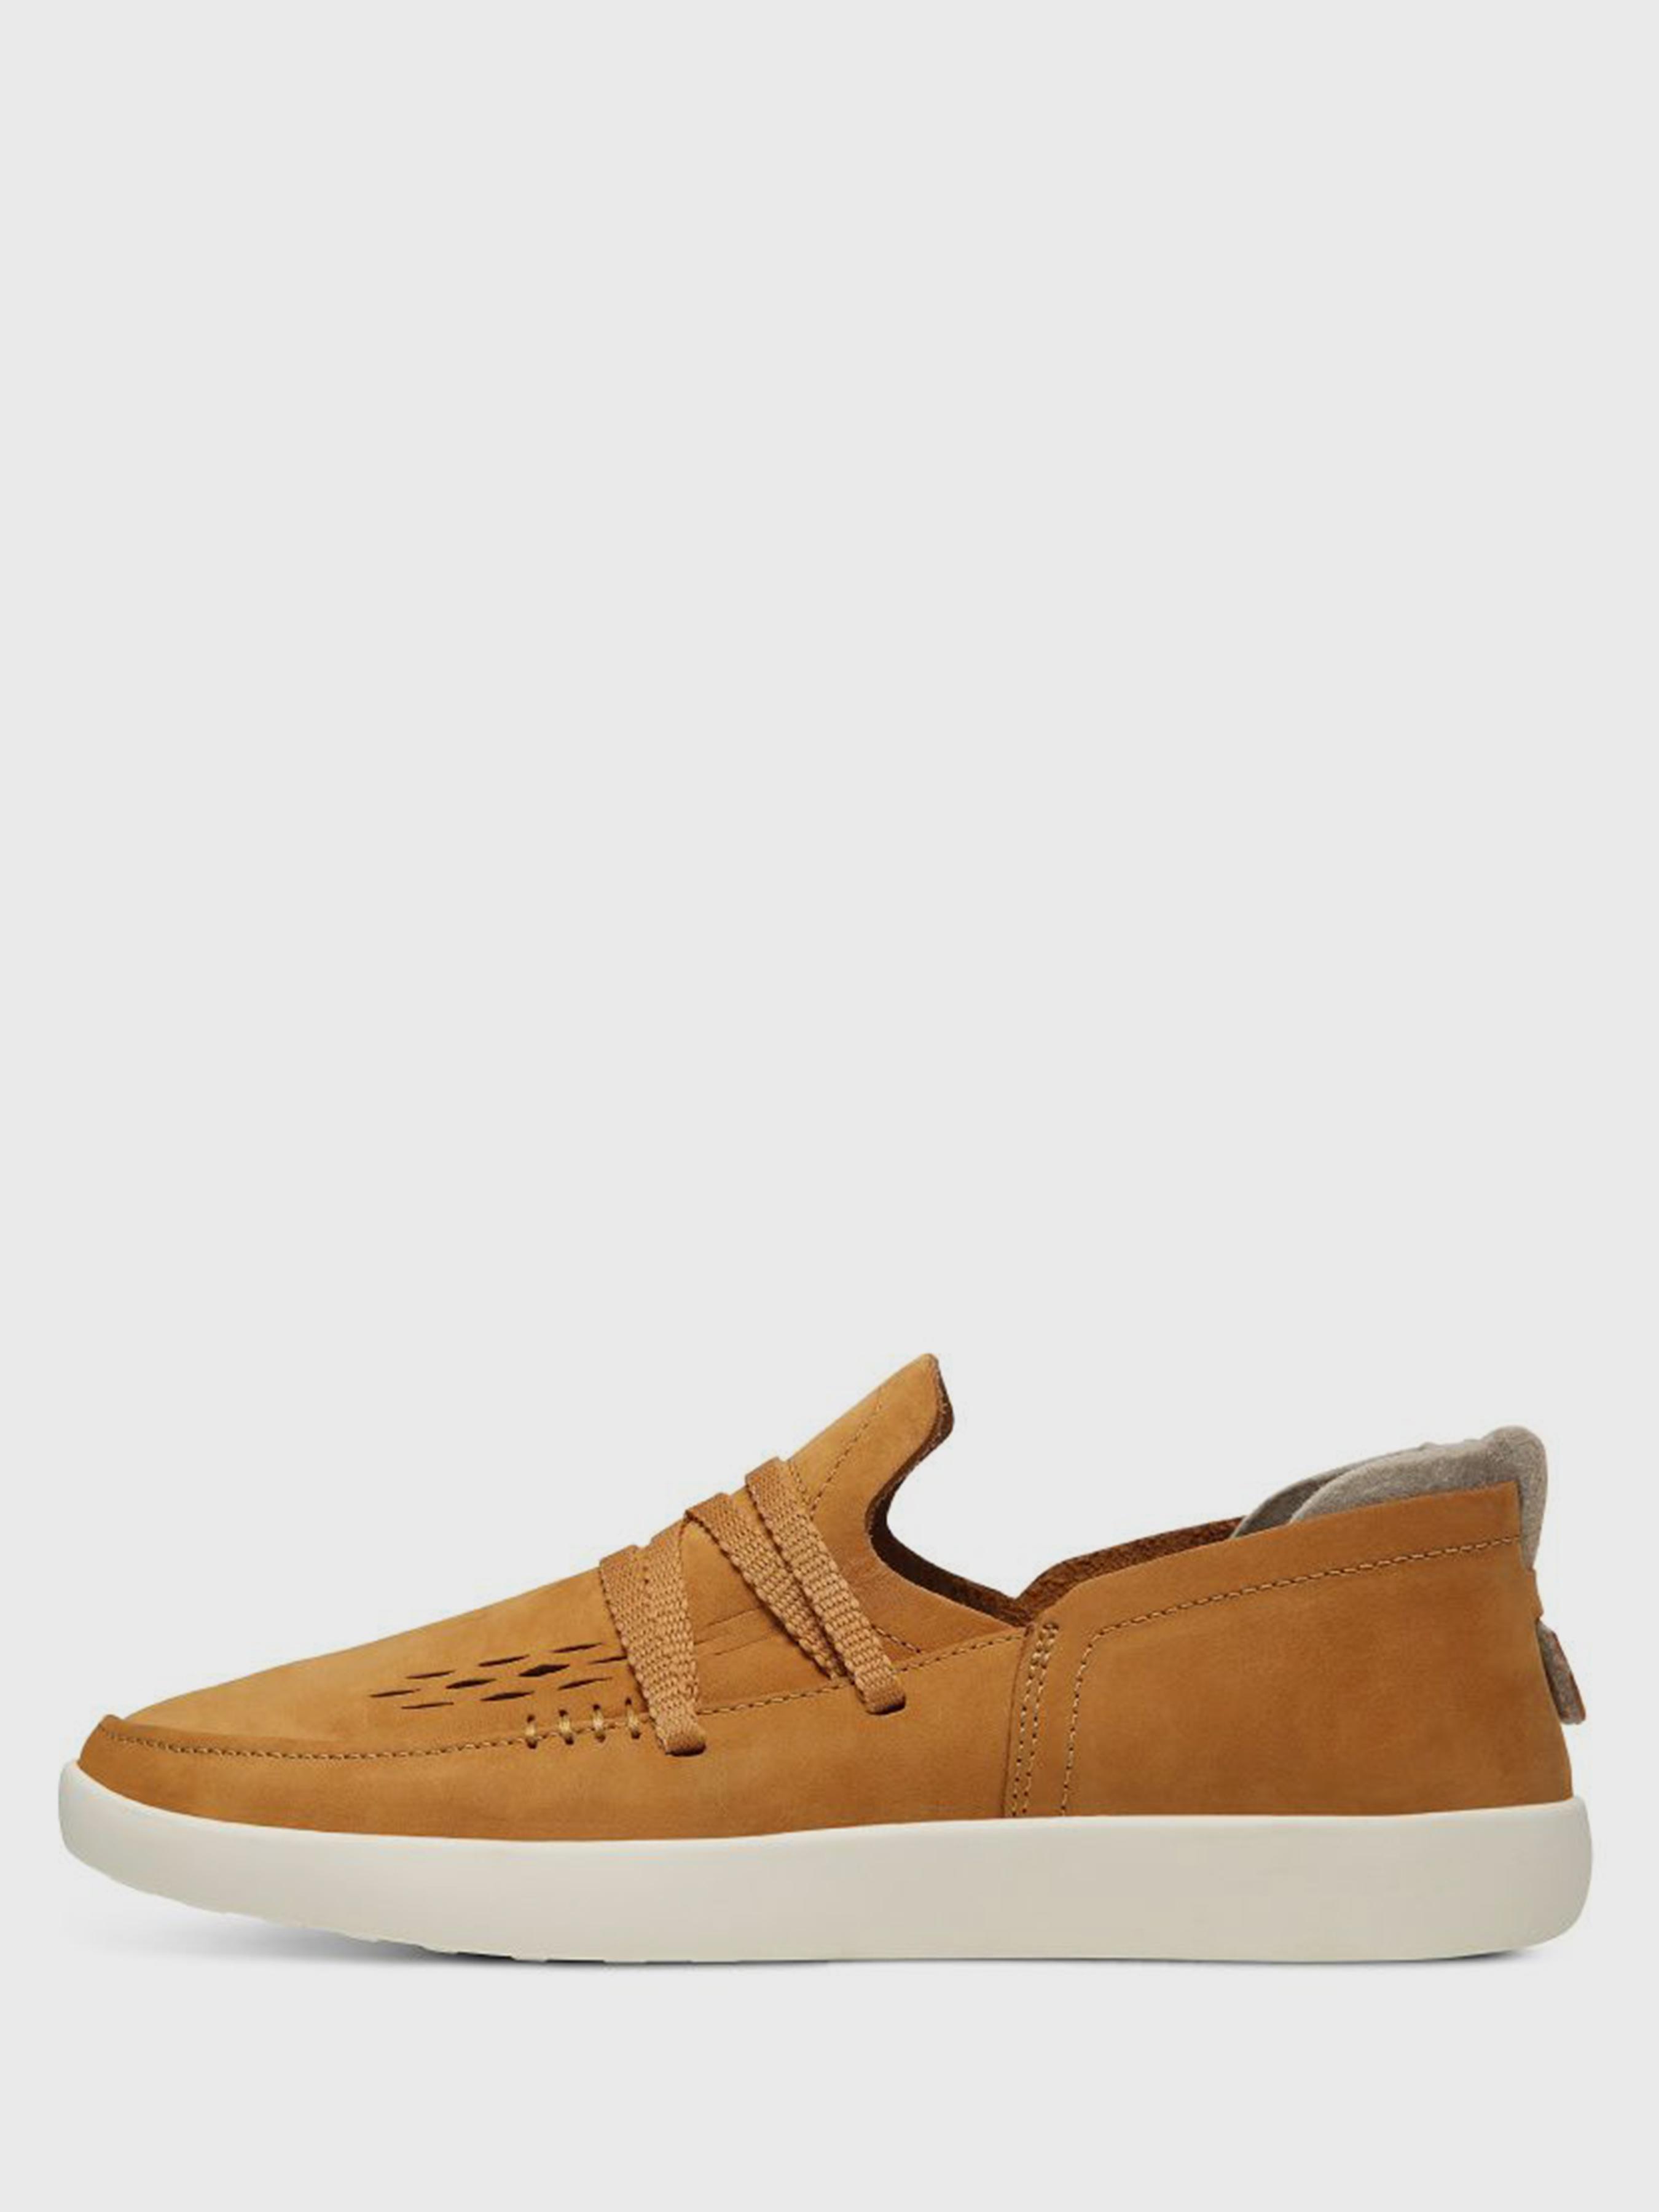 Cлипоны для мужчин Timberland Project Better TF3893 цена обуви, 2017